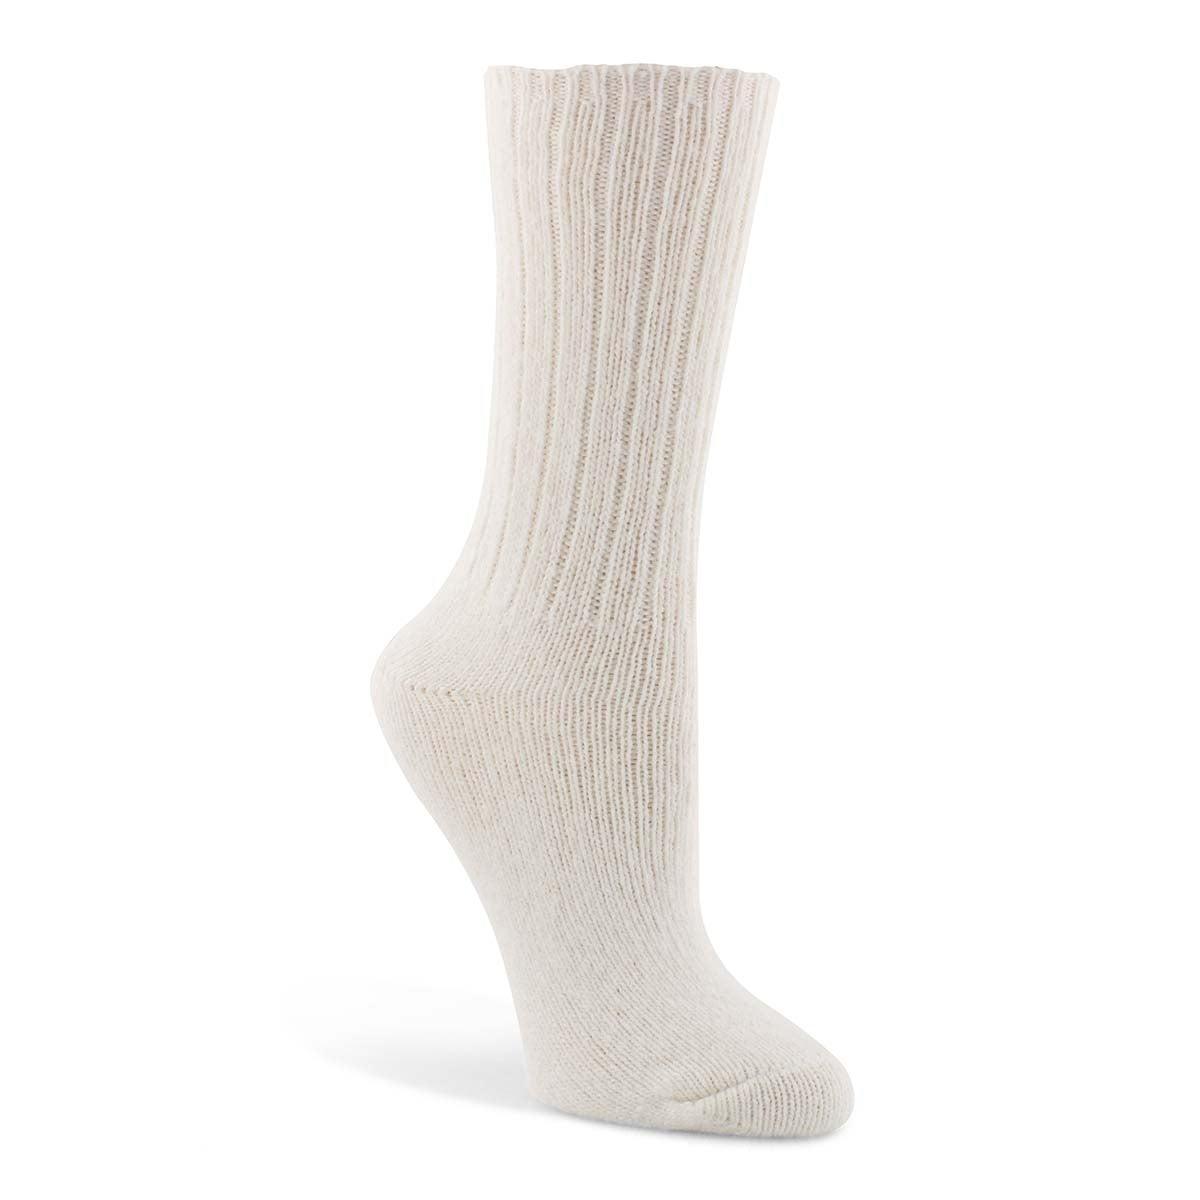 Lds Duray white 3/4 crew sock